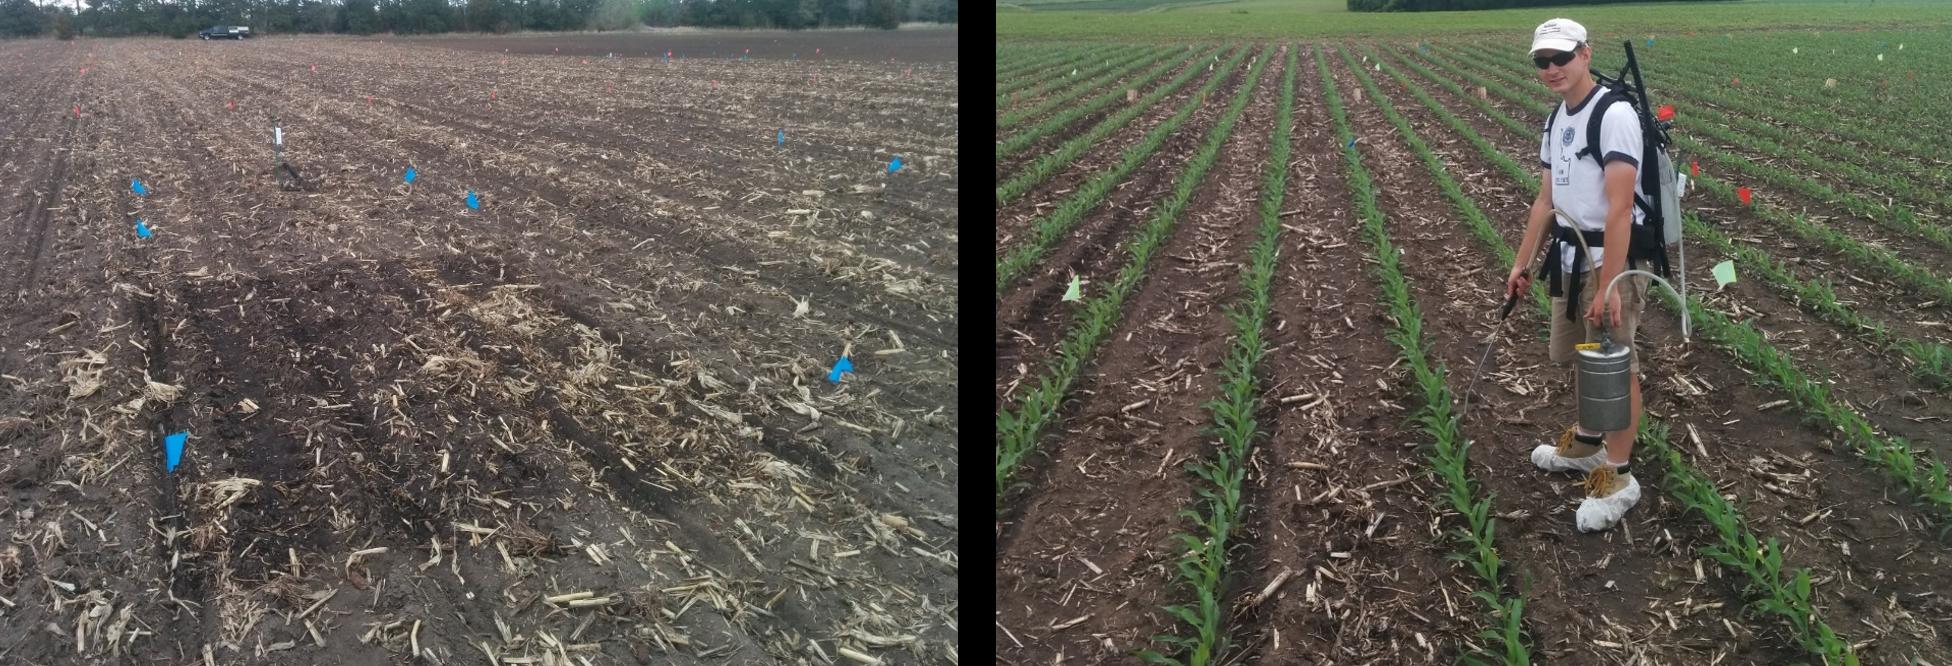 Left: The microplot immediately after receiving 15N enriched urea fertilizer